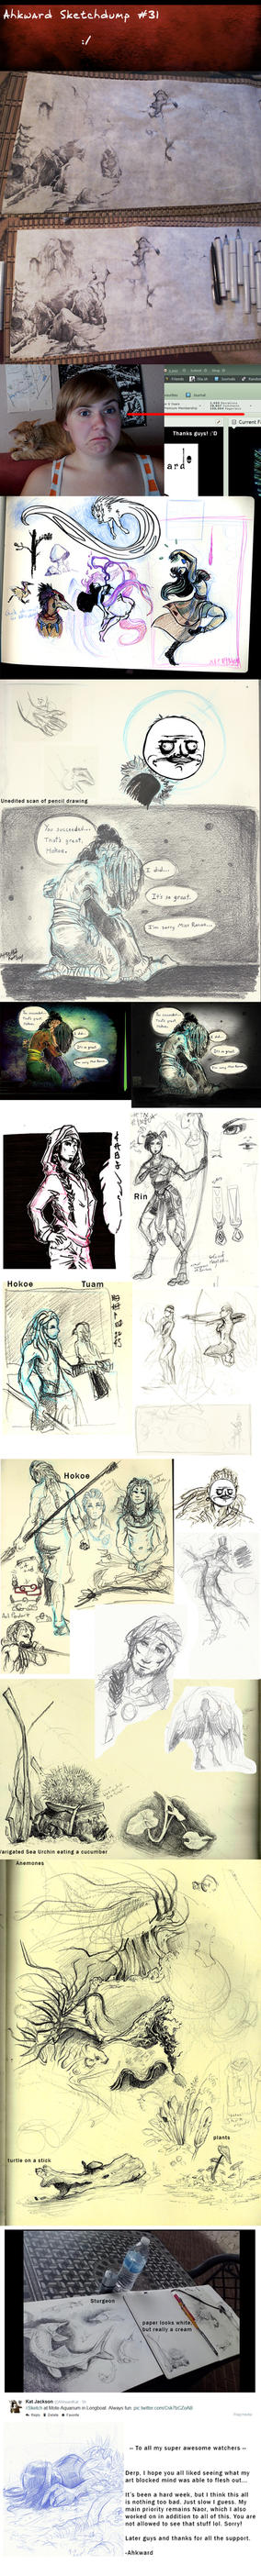 Sketchdump #31 - The ArtBlock by Ahkward